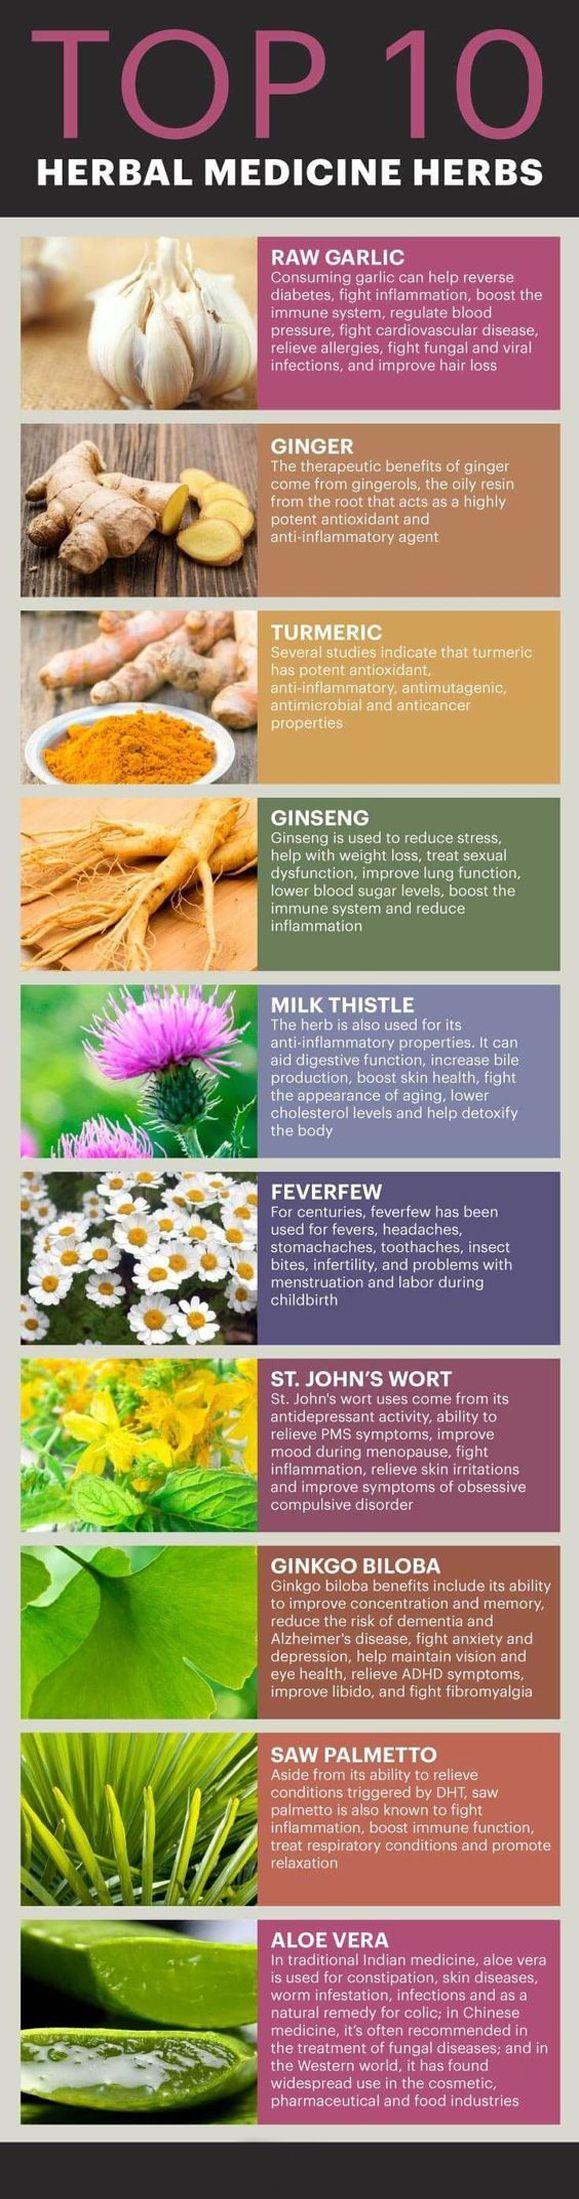 43++ Indian herbs for diabetes ideas